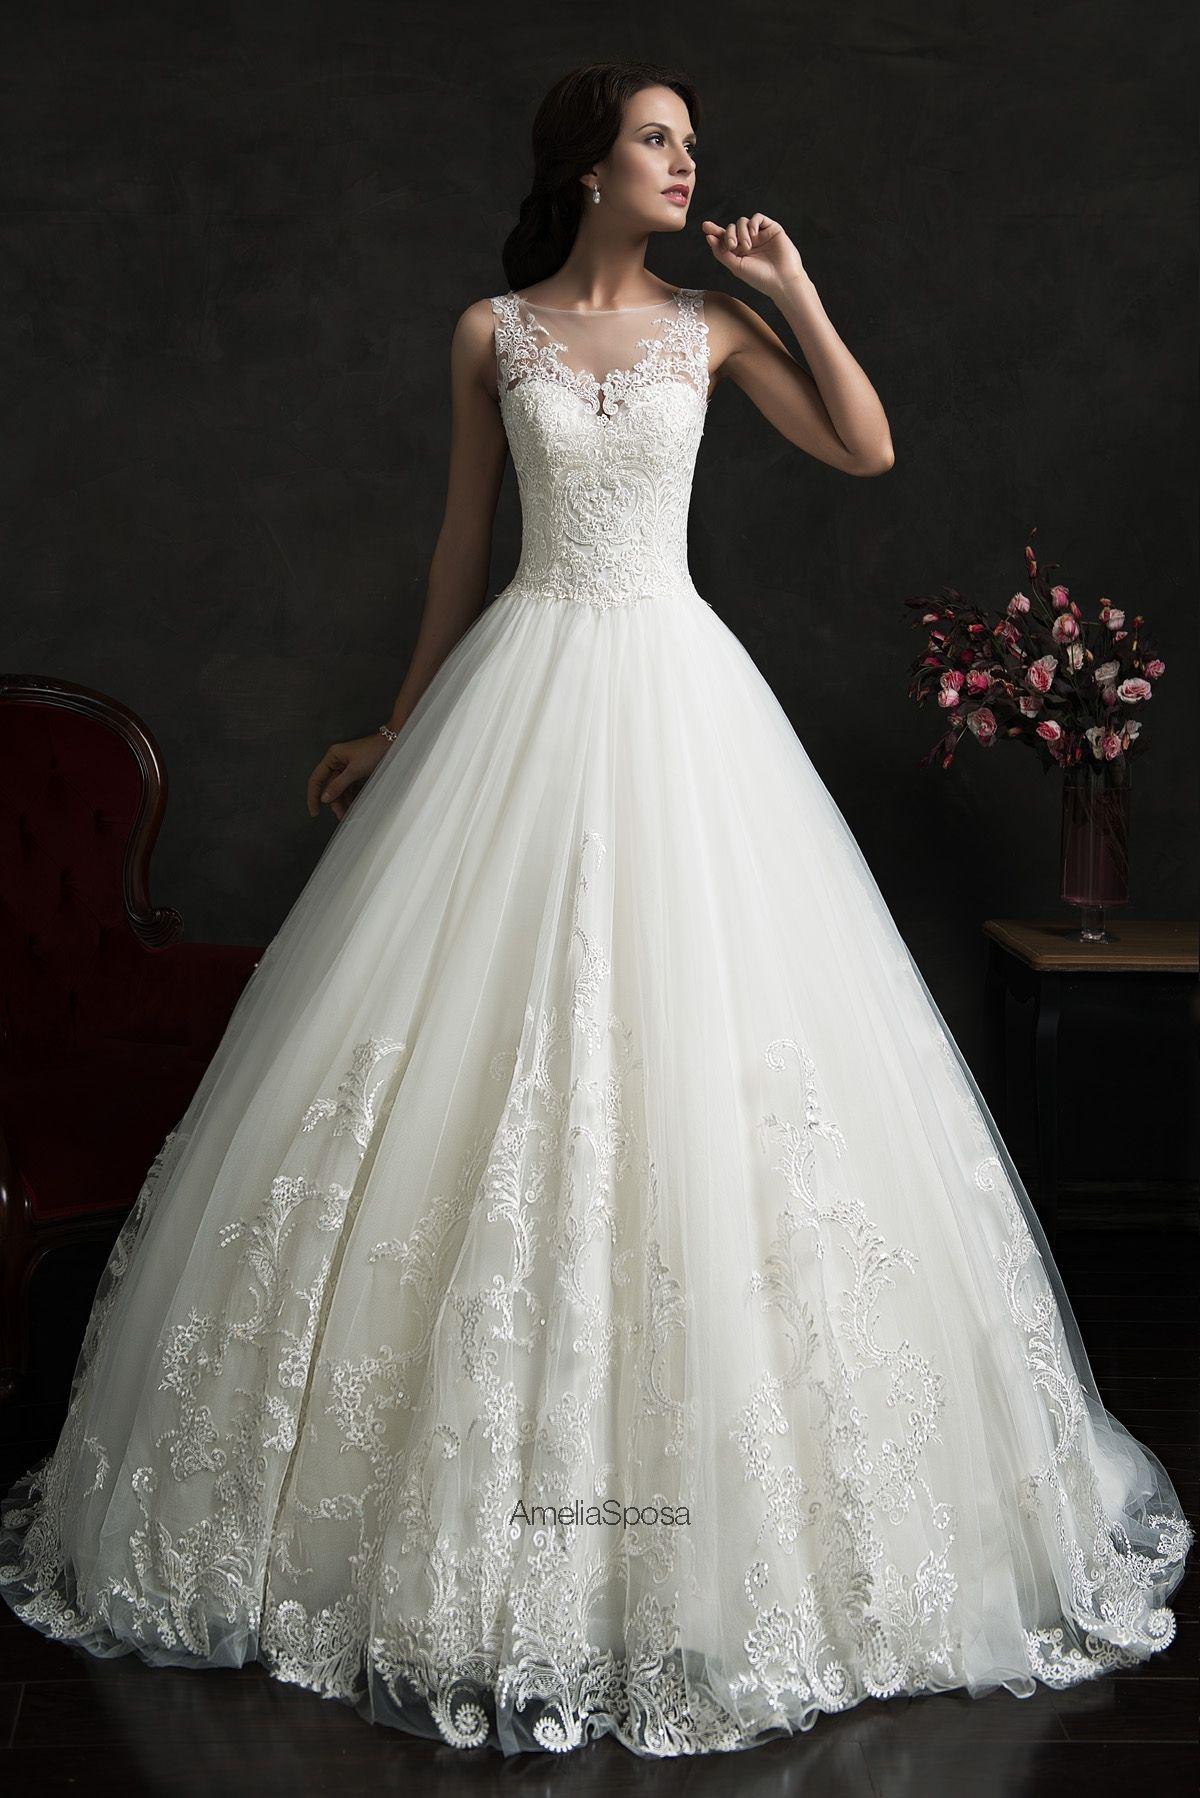 Dipped wedding dress  AMELIA SPOSA   Wedding Dress Elza  Wedding Dresses  Pinterest